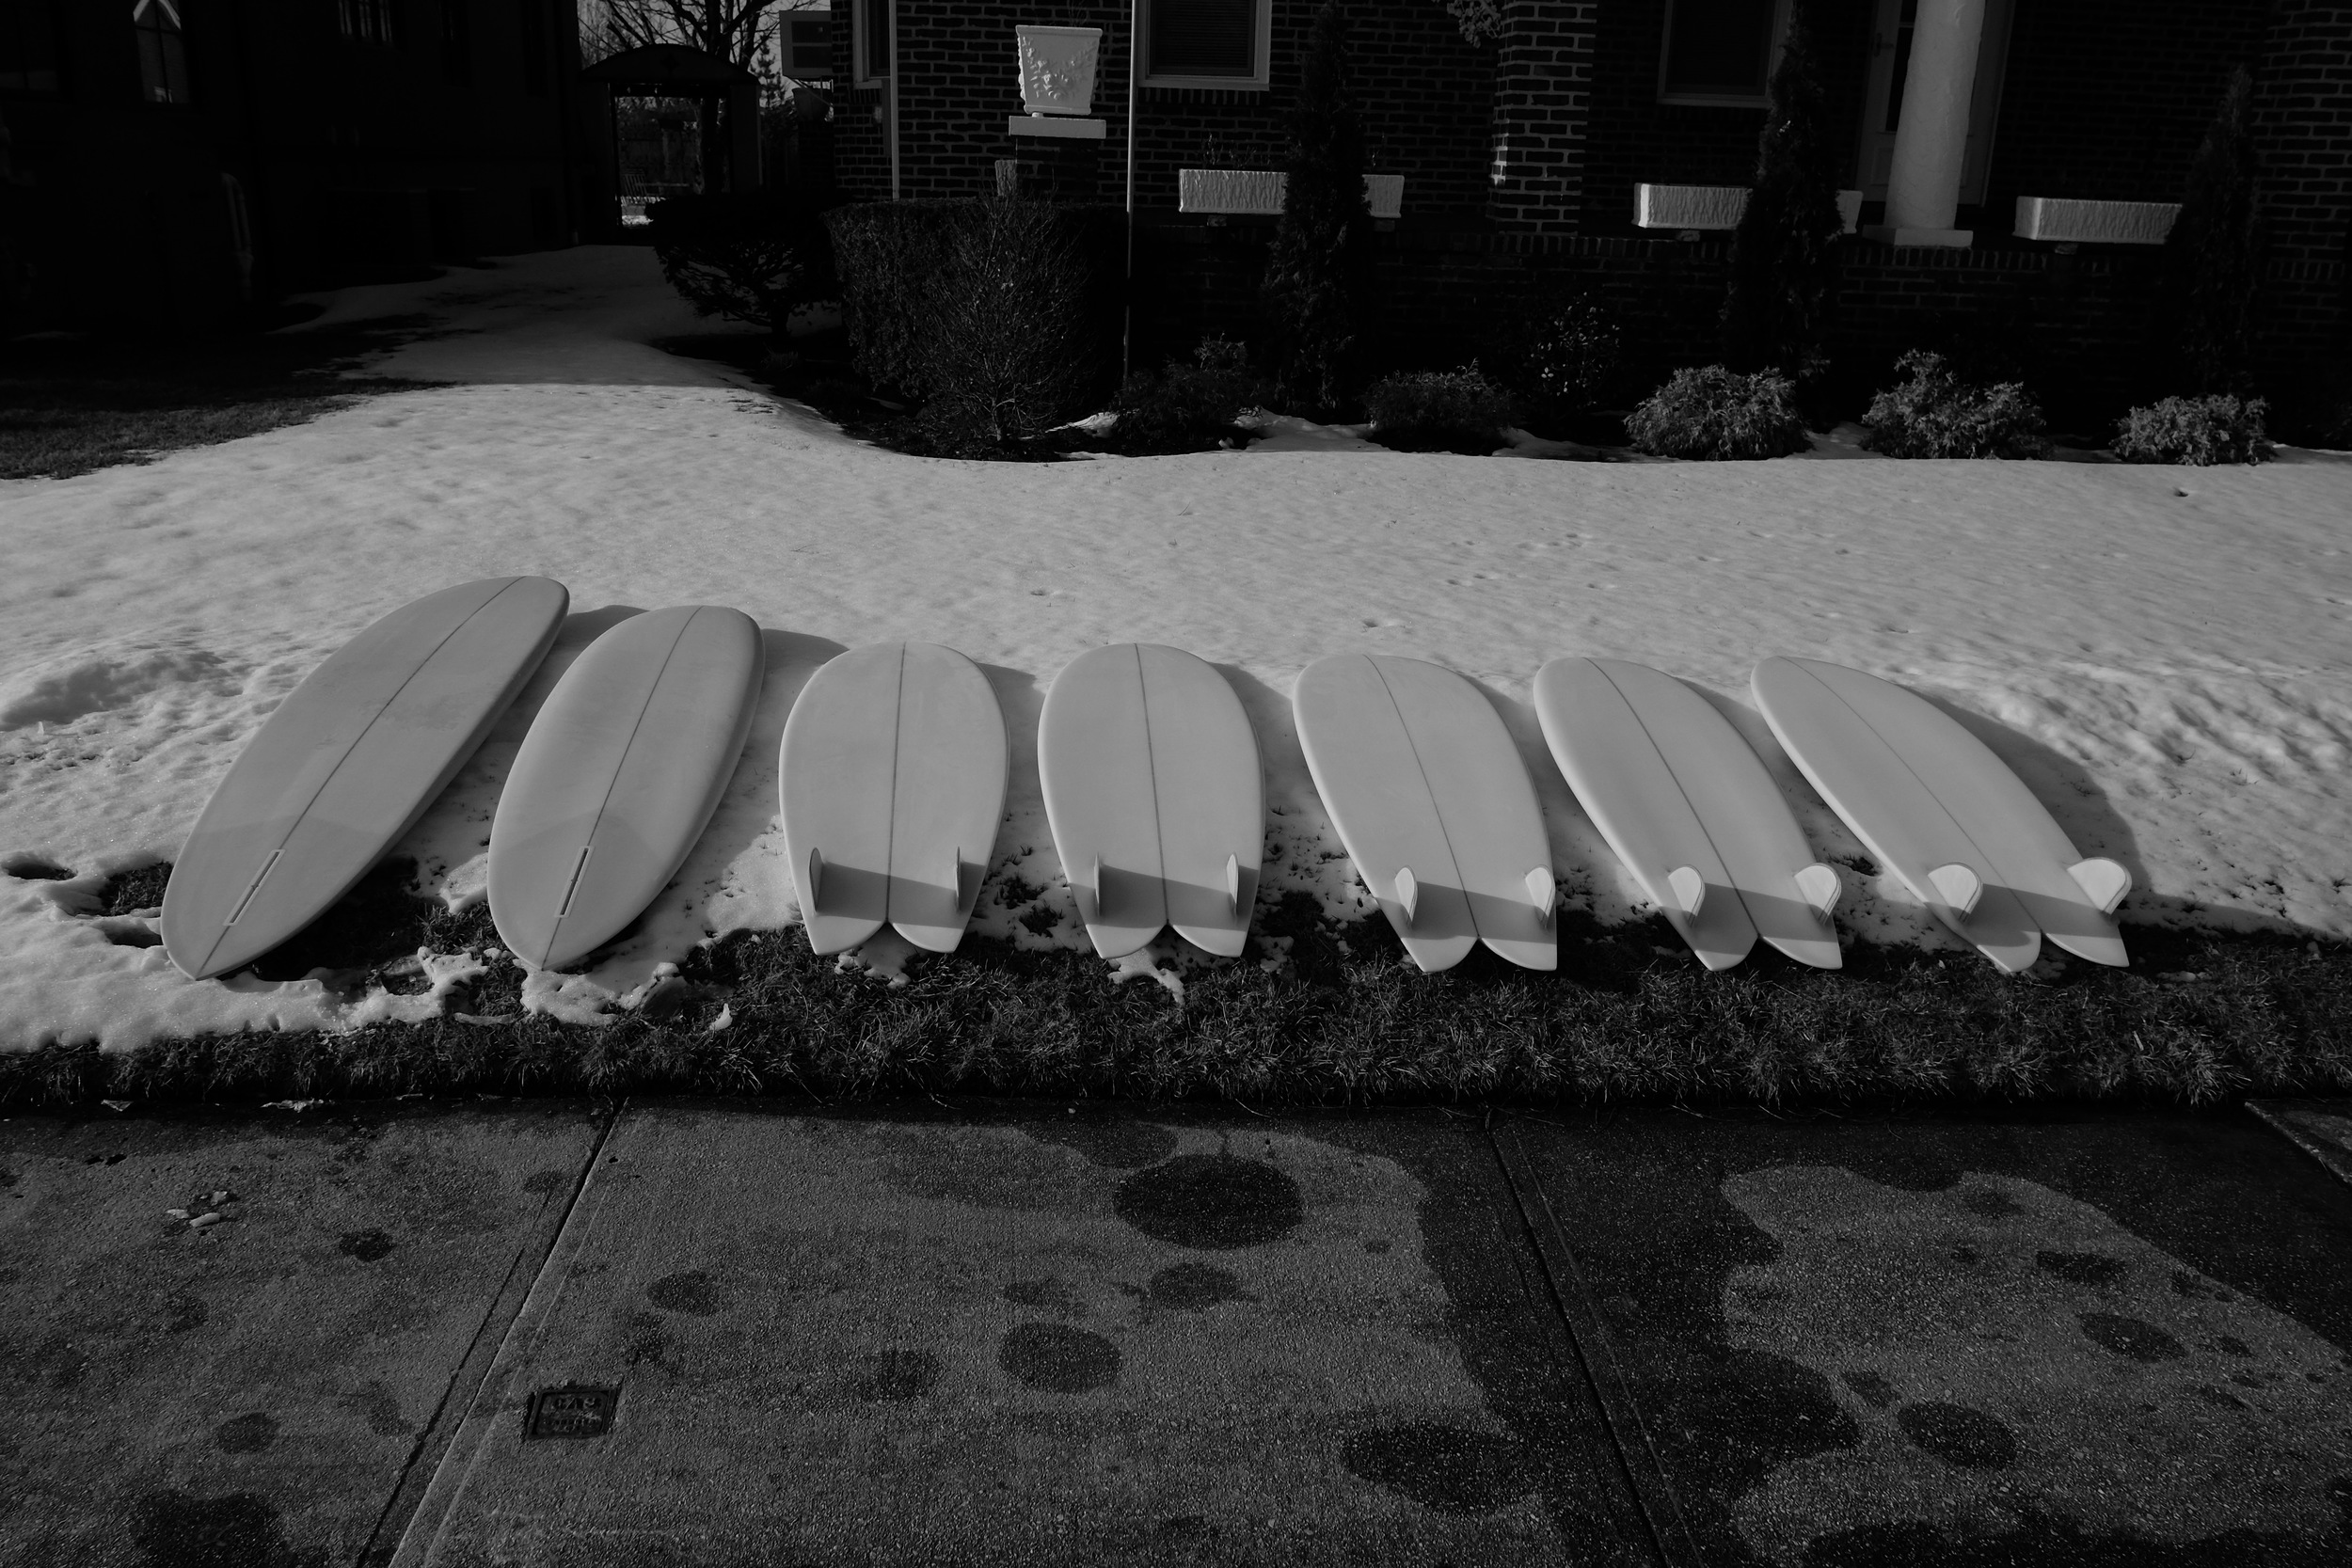 Falcone_Surfboard_Mar2015_LawnShotjpg